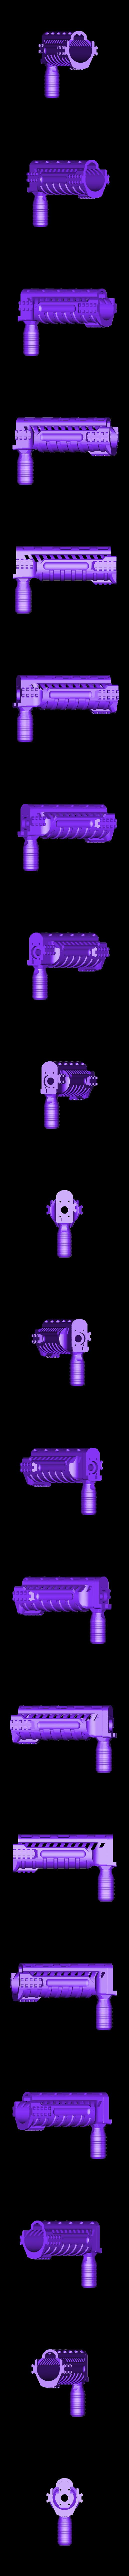 UNW_Long_shroud_NR_grip_v2.stl Download free STL file FGC 9 UNW No rail Long and medium Shroud • 3D printer model, UntangleART